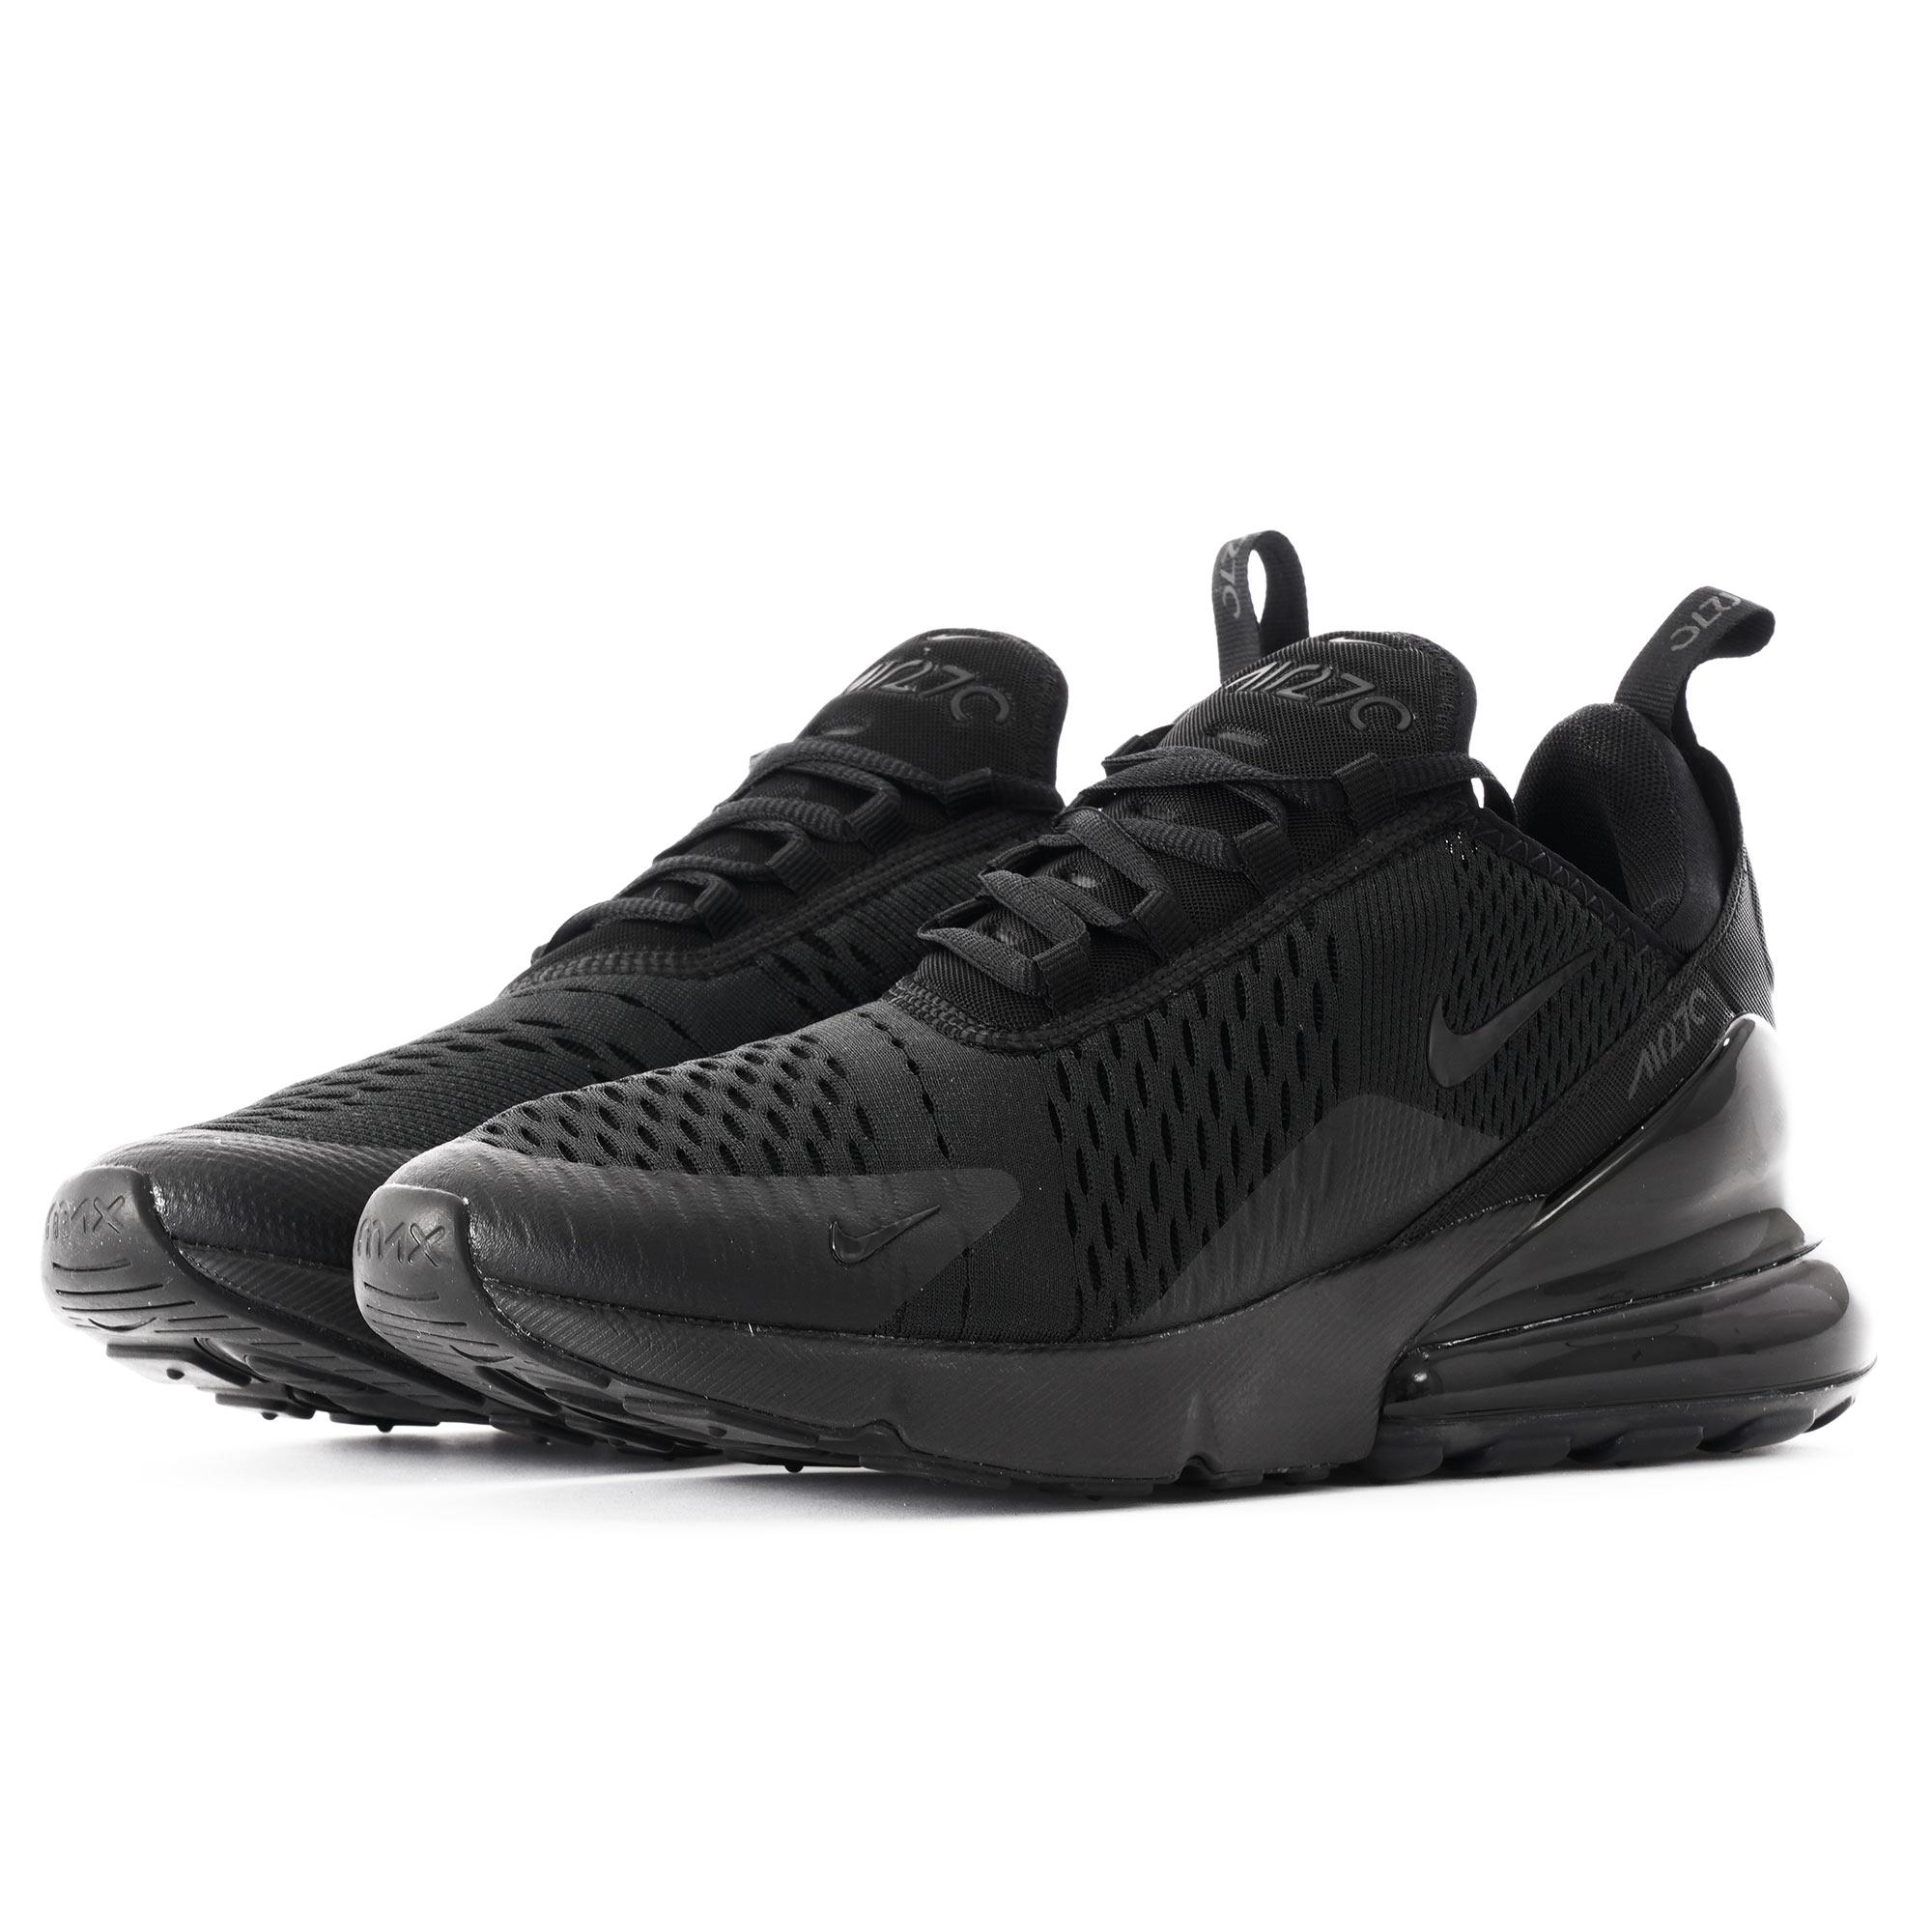 Nike Air Max 270 Black AH8050 005